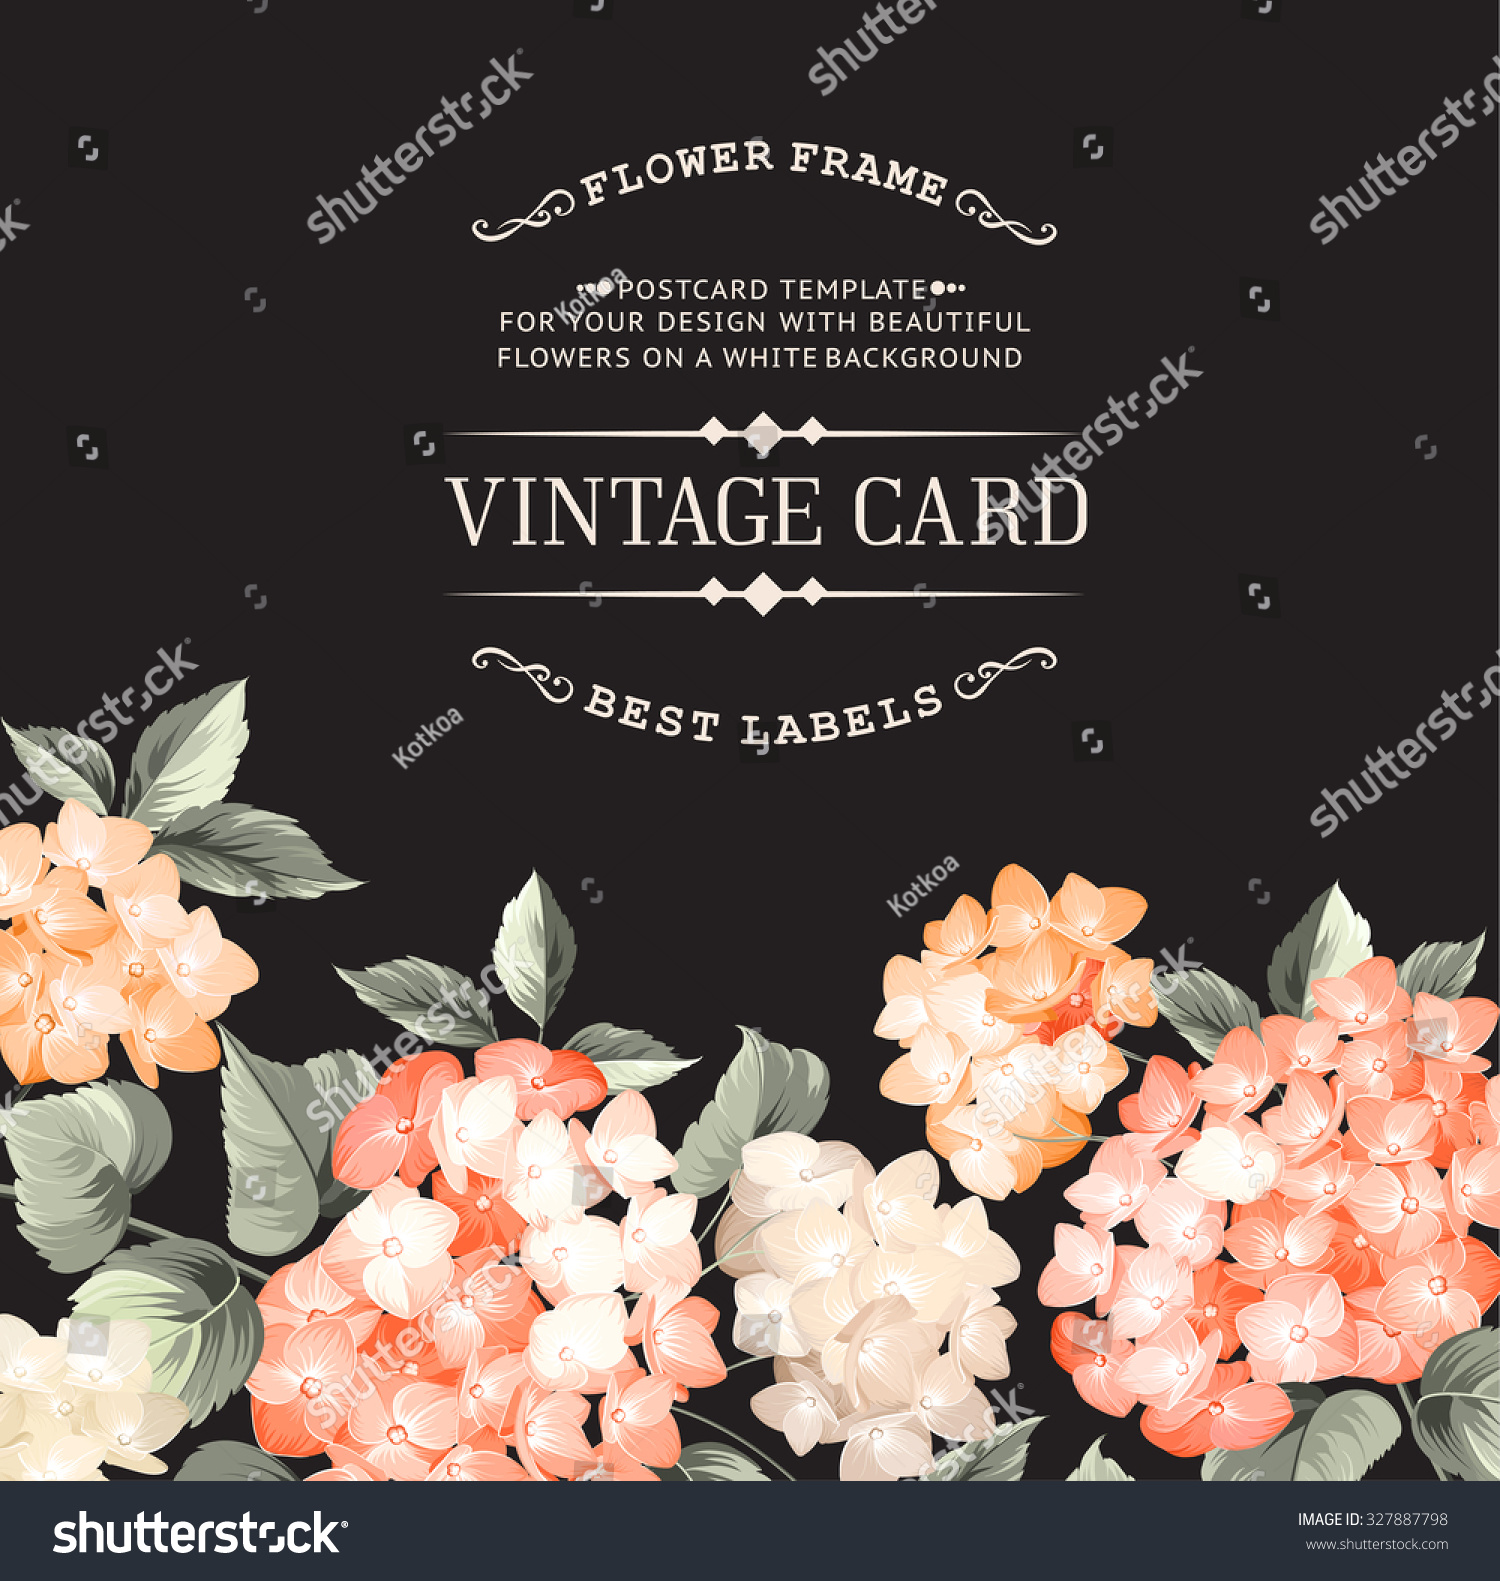 Wedding Altar Call: Vintage Card For Wedding Invitation… Stock Photo 327887798